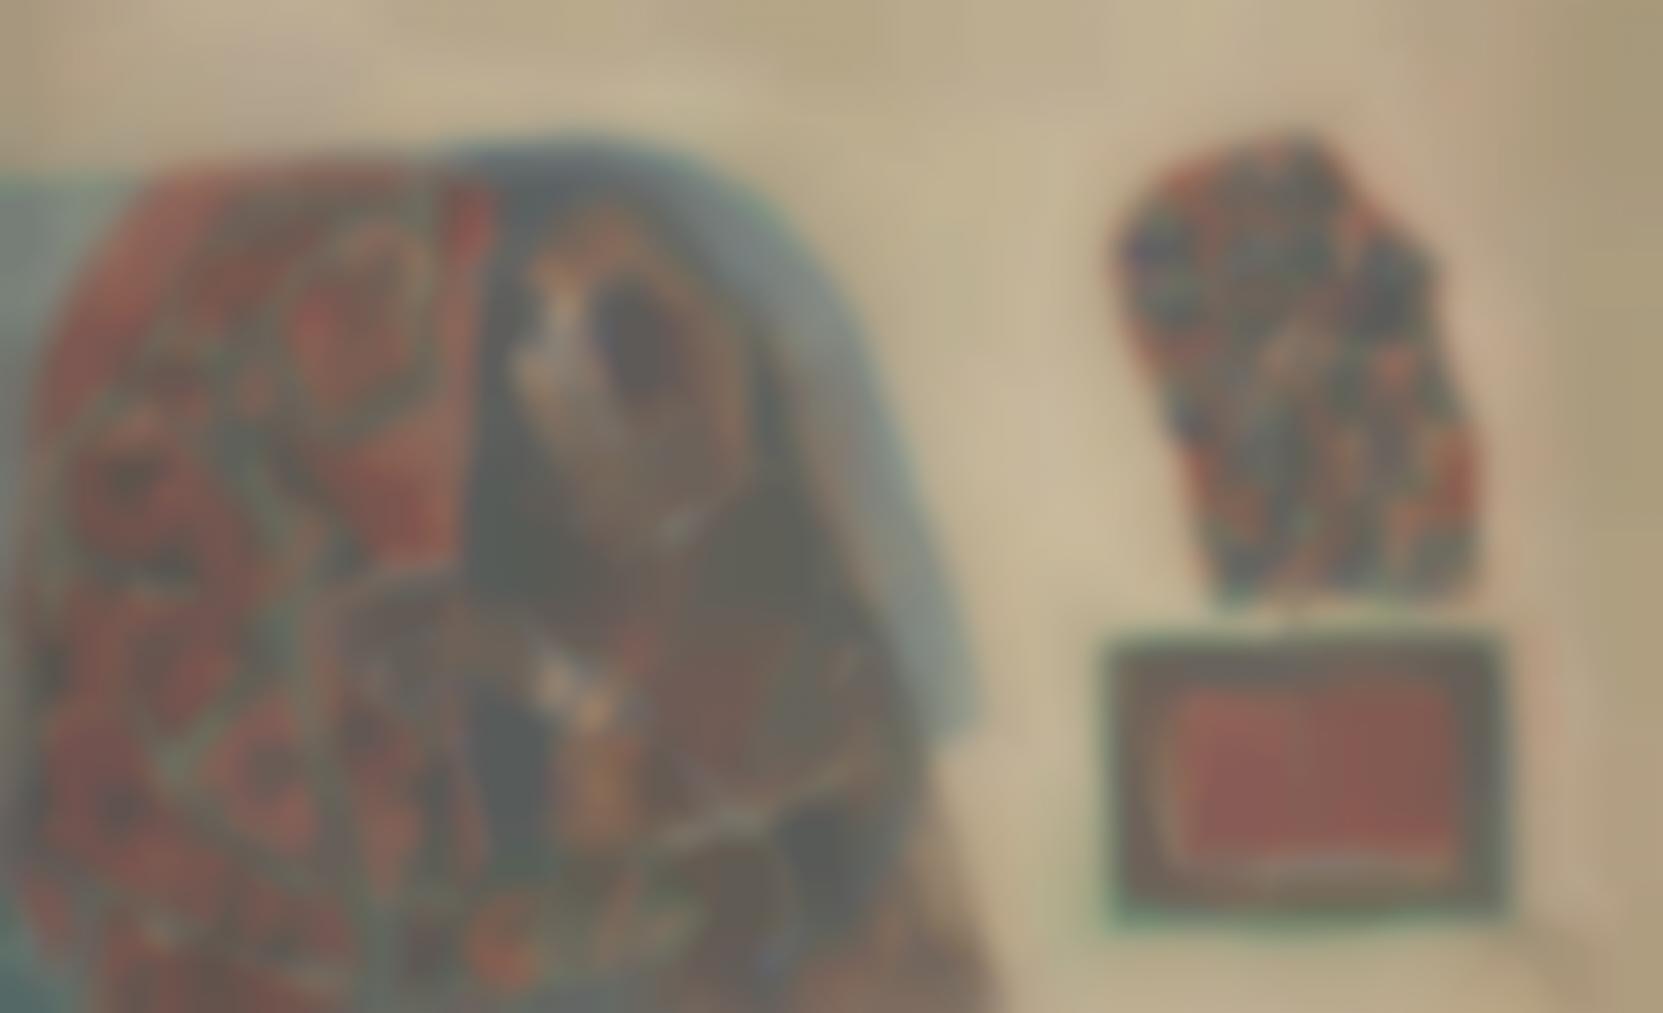 Maqbool Fida Husain-Untitled (Two Women)-1960